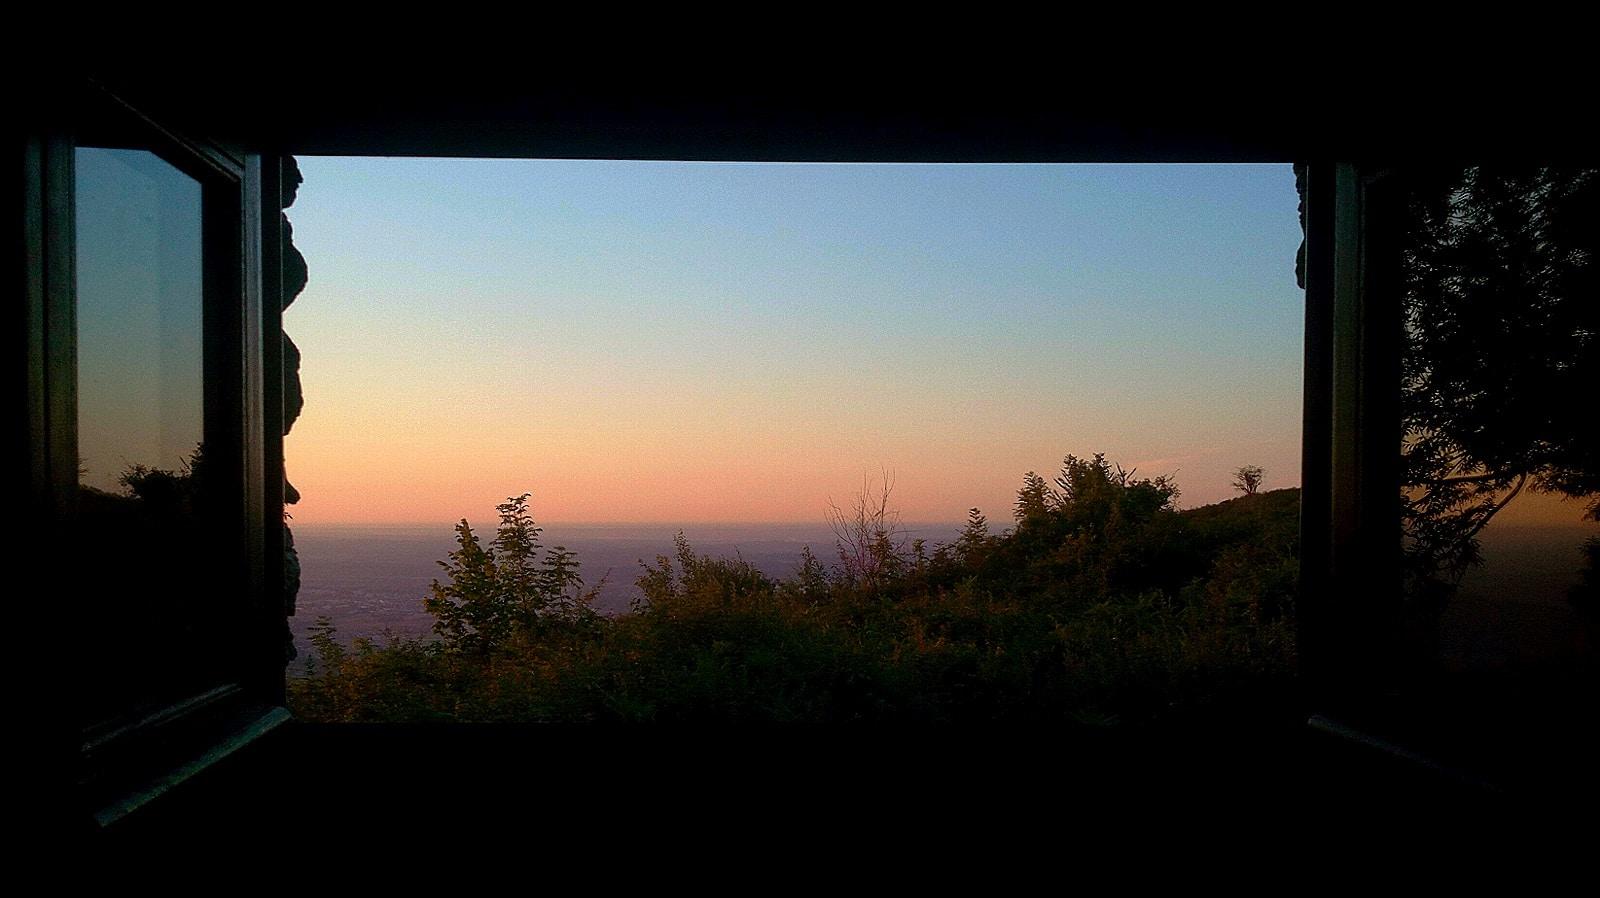 sunset vallée d'aspe cabane